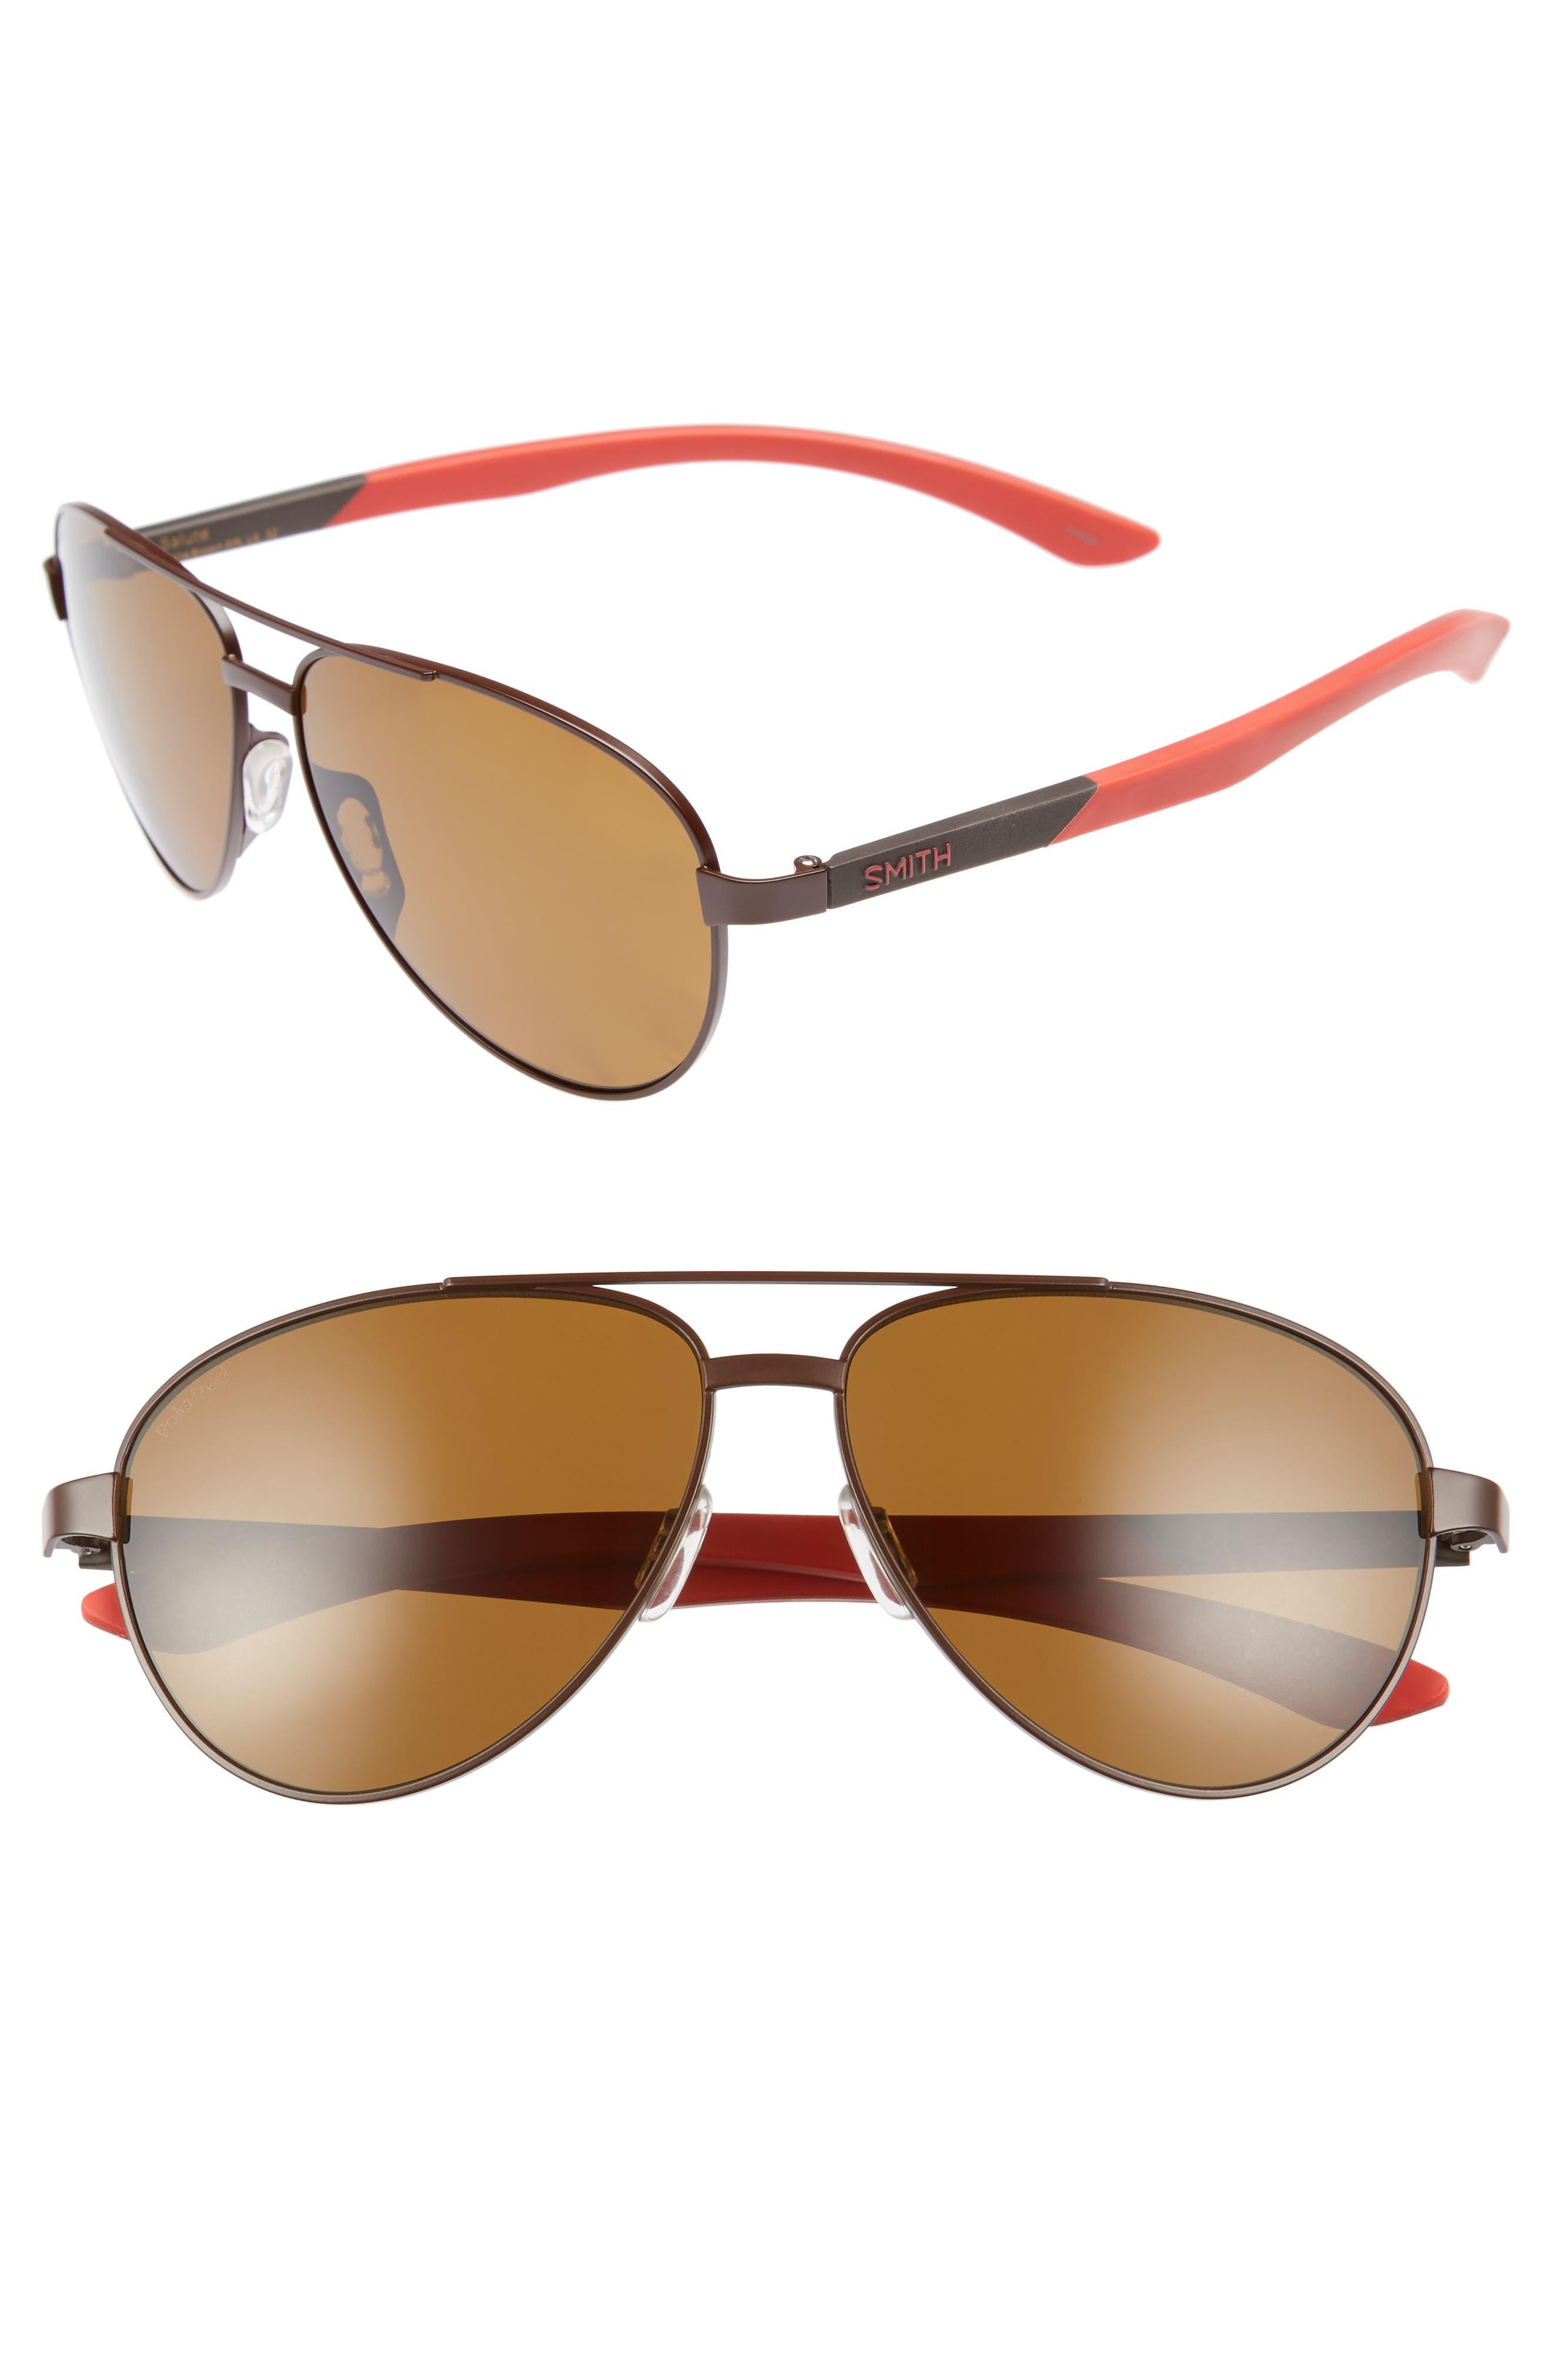 Salute 59mm Polarized Aviator Sunglasses,                             Main thumbnail 1, color,                             200